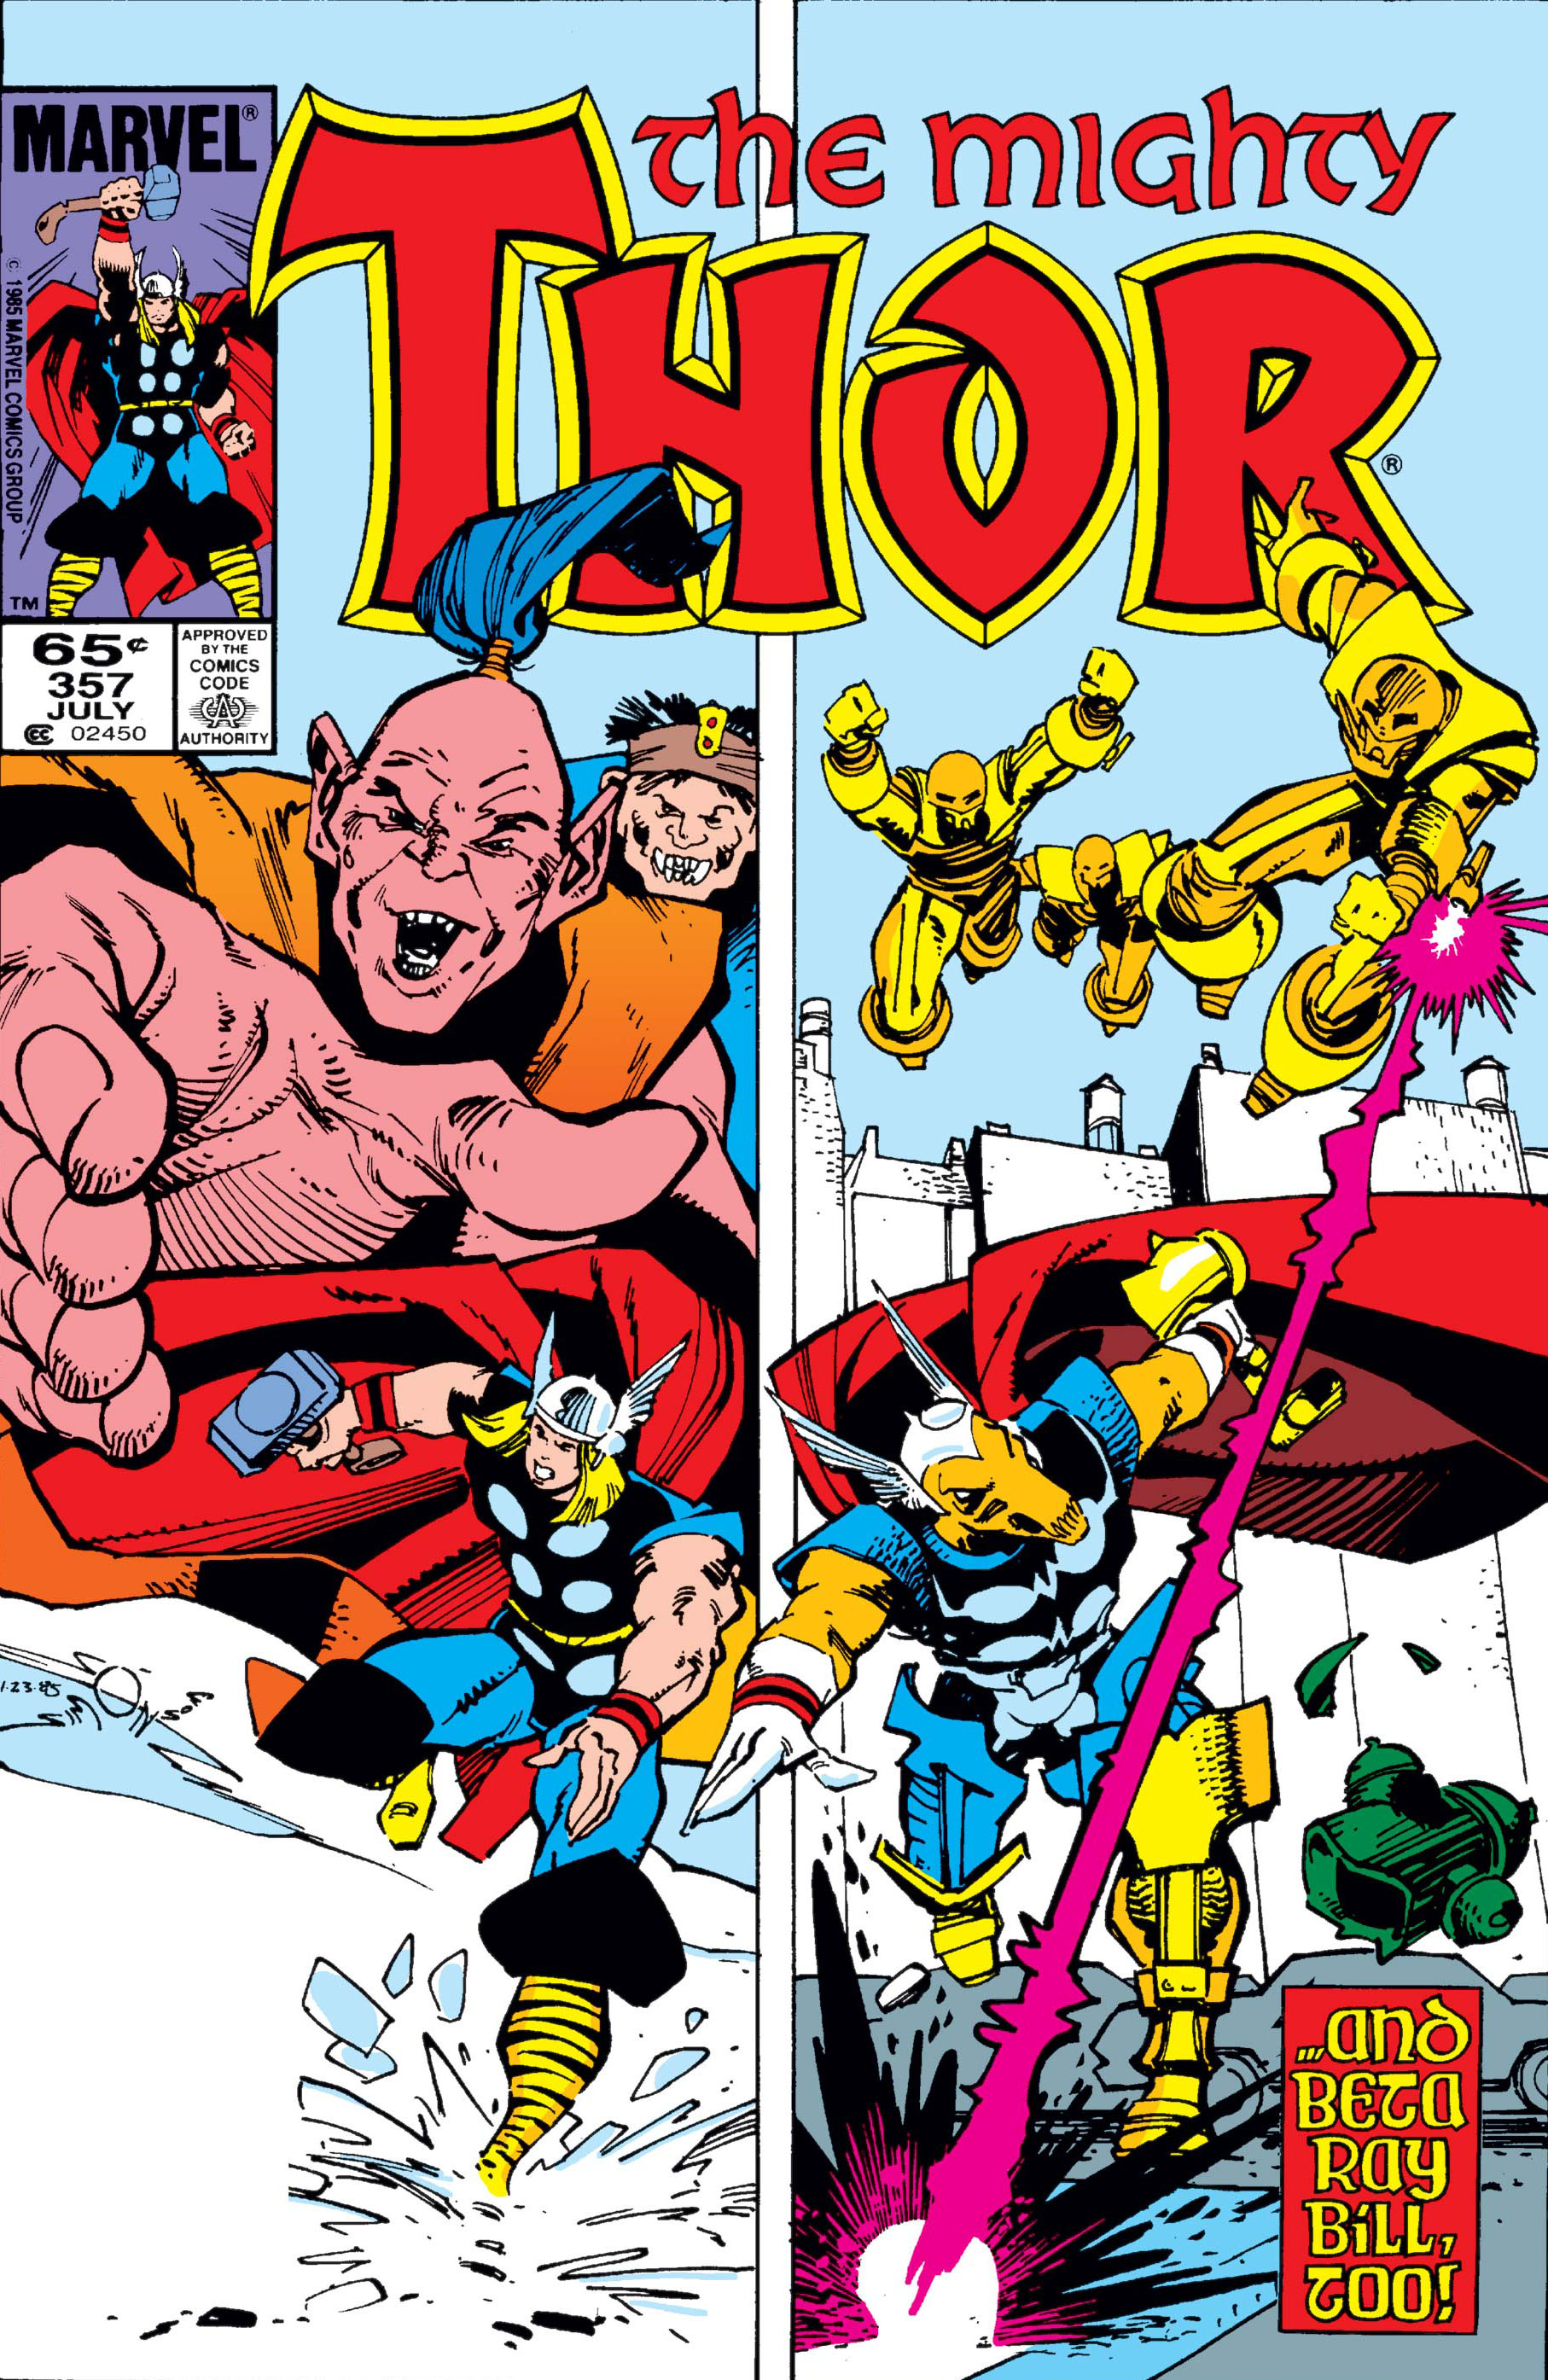 Thor (1966) #357